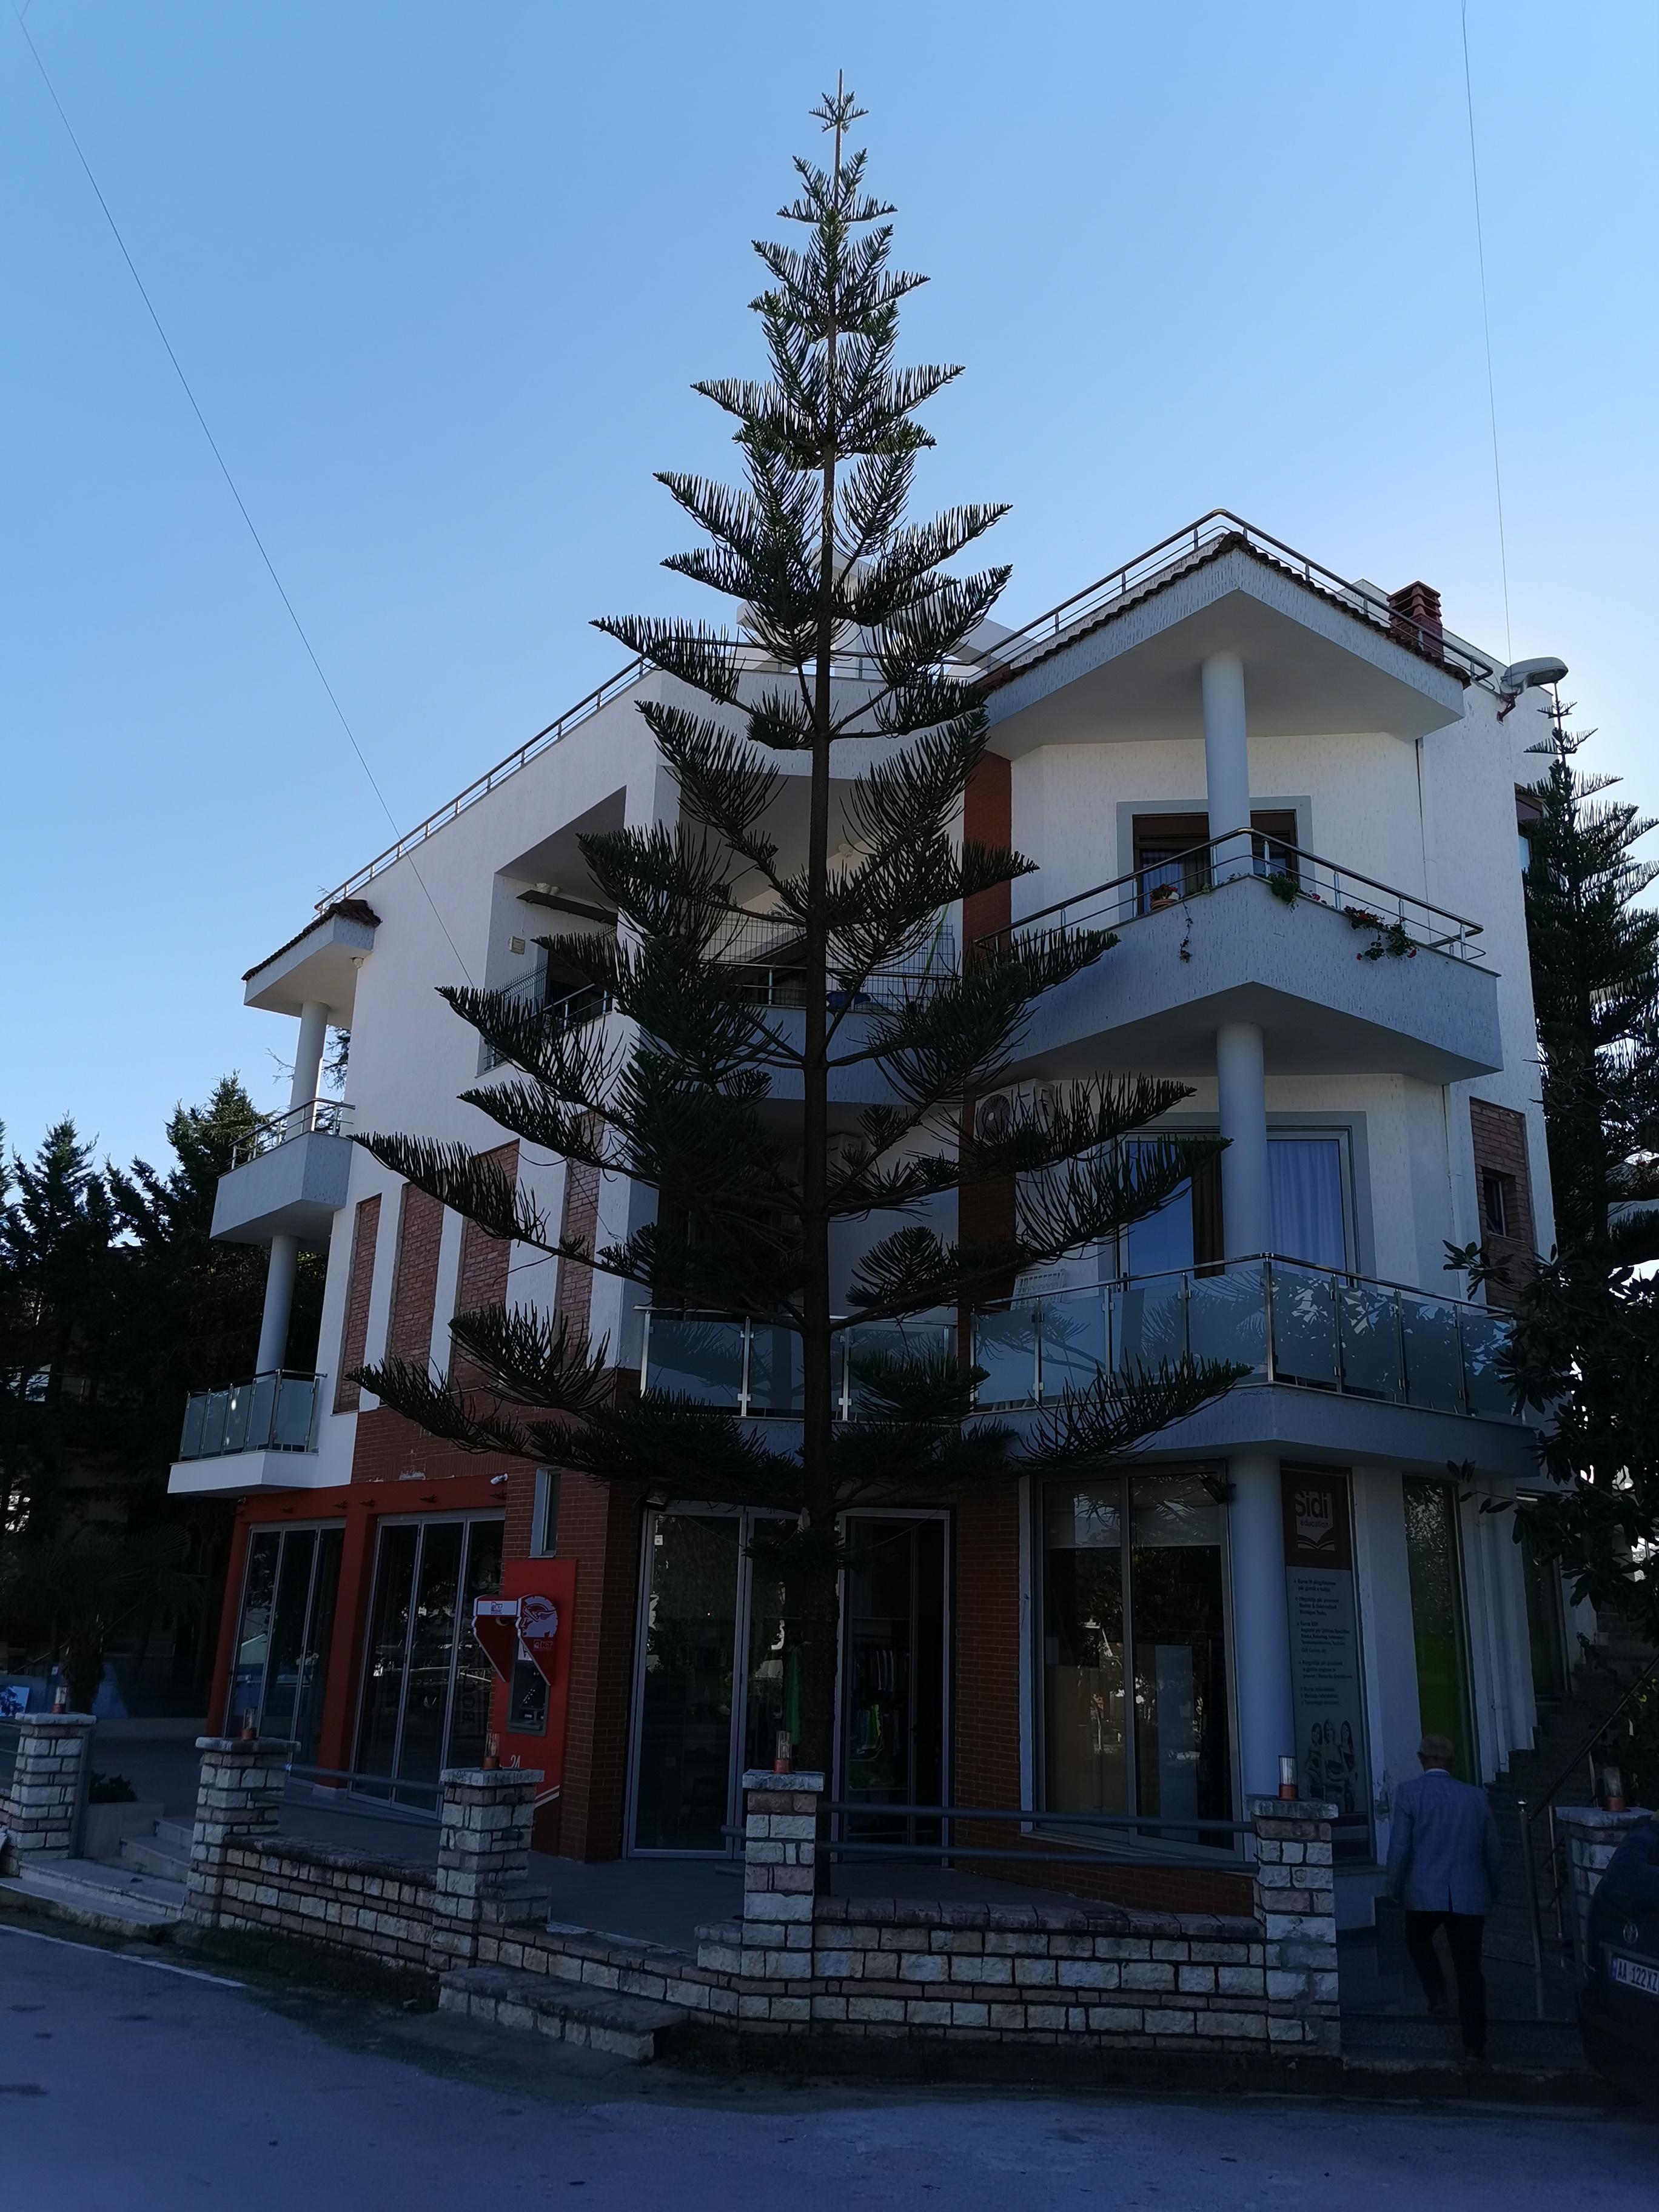 Letovanje Albanija hoteli, Ksamil, autobus, Hotel Joni, spolja